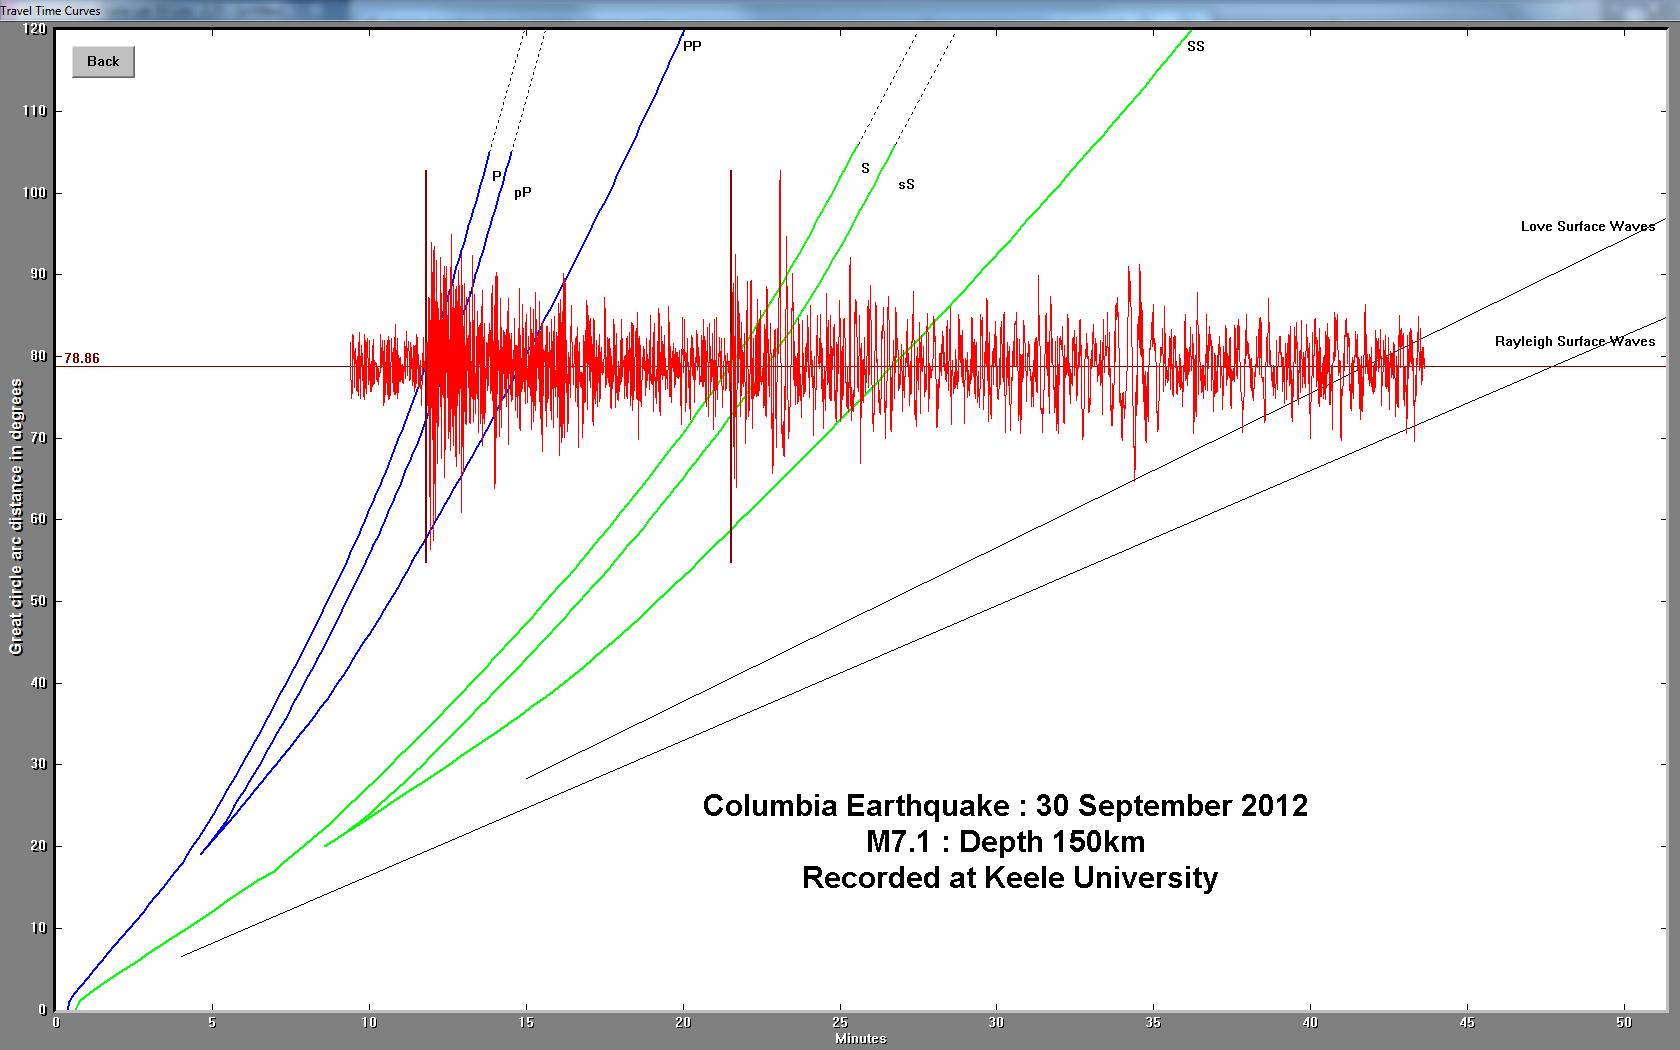 Columbia earthquake recorded at Keele, UK